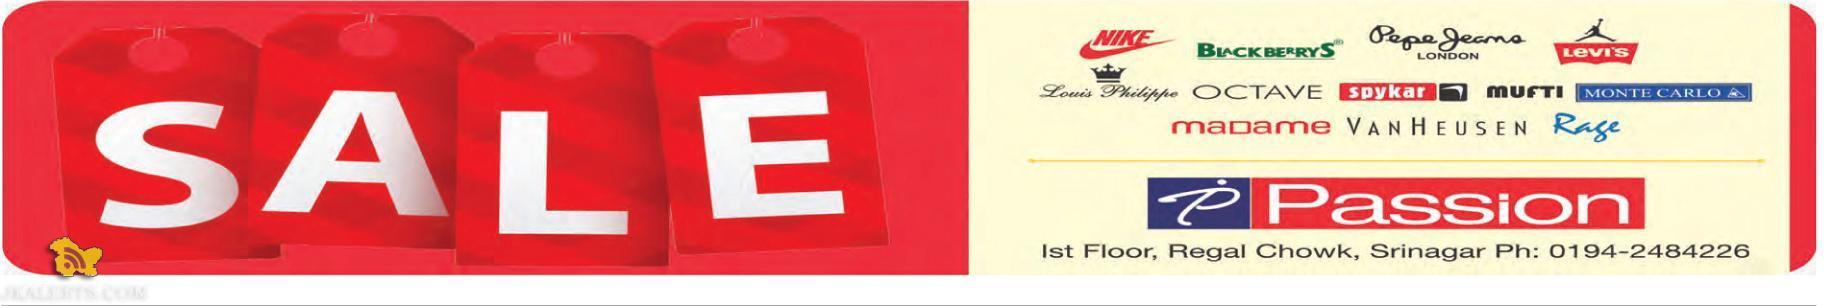 Sale in Passion, Regal Chowk Srinagar